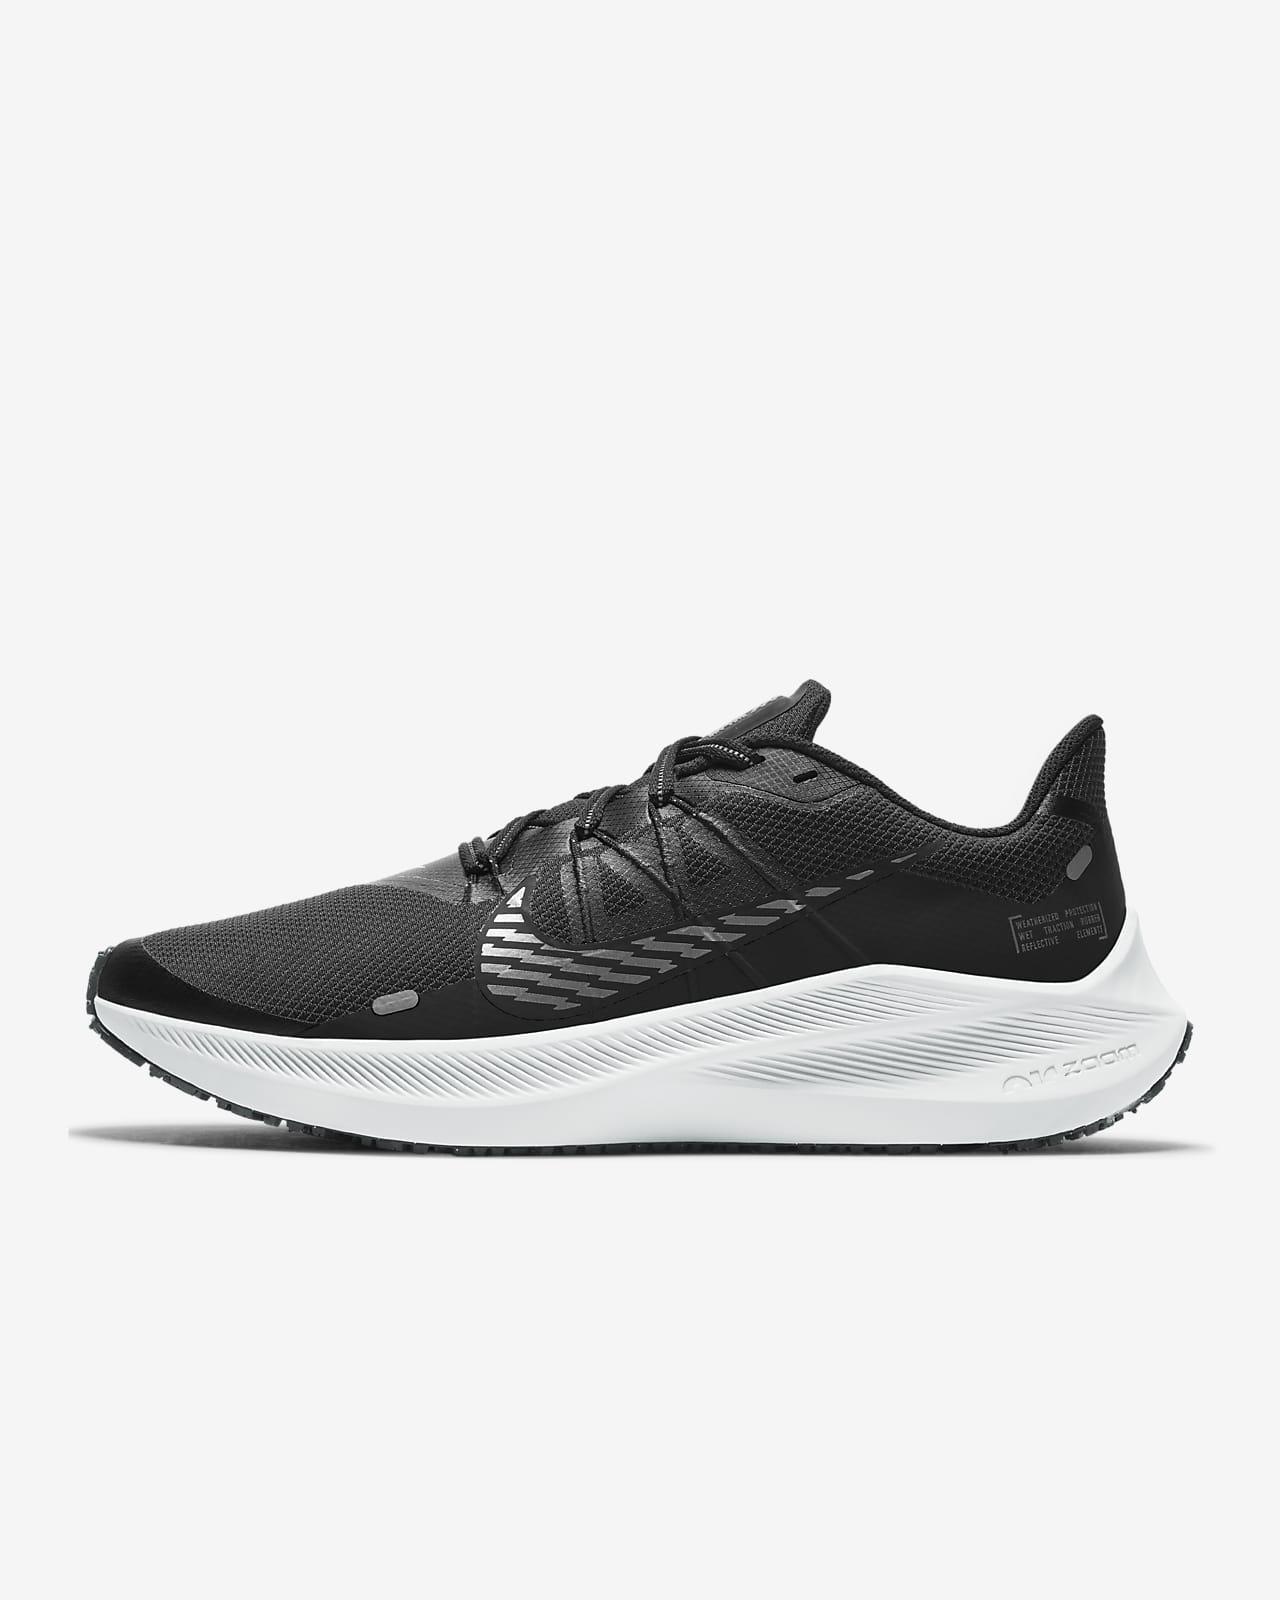 Nike Winflo 7 Shield 男子跑步鞋